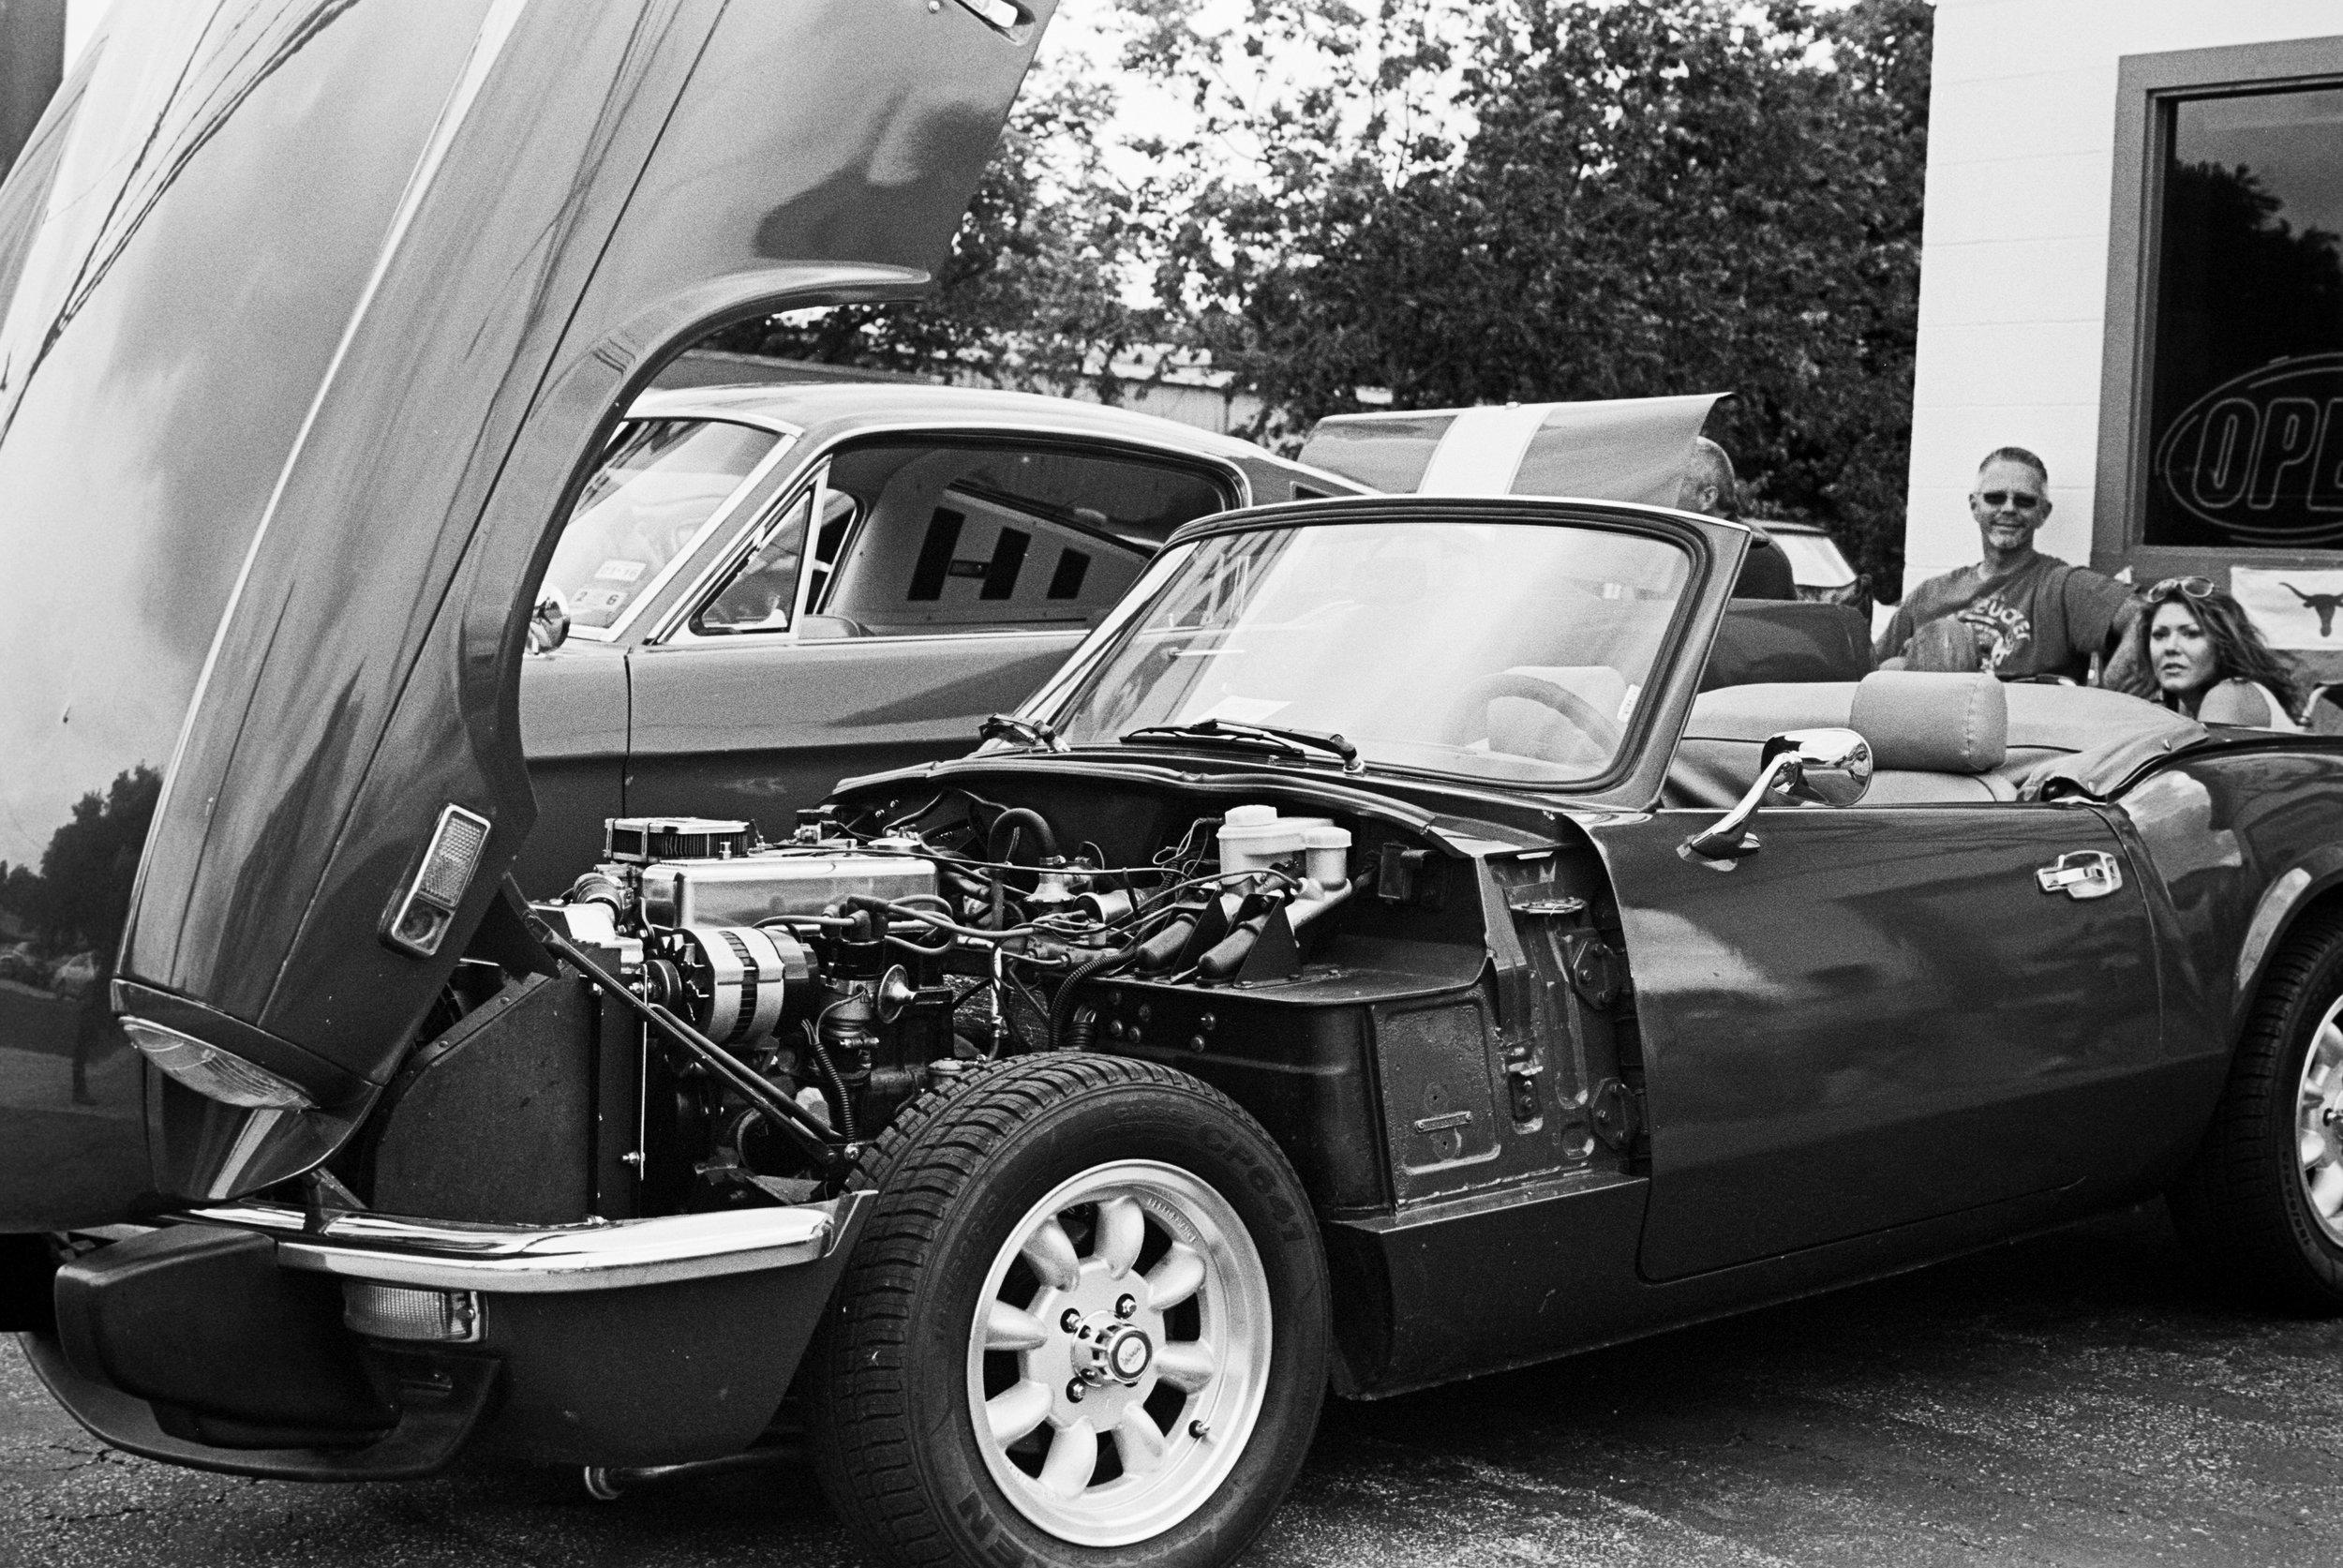 car-show-little-longhorn-saloon-2015-036.jpg